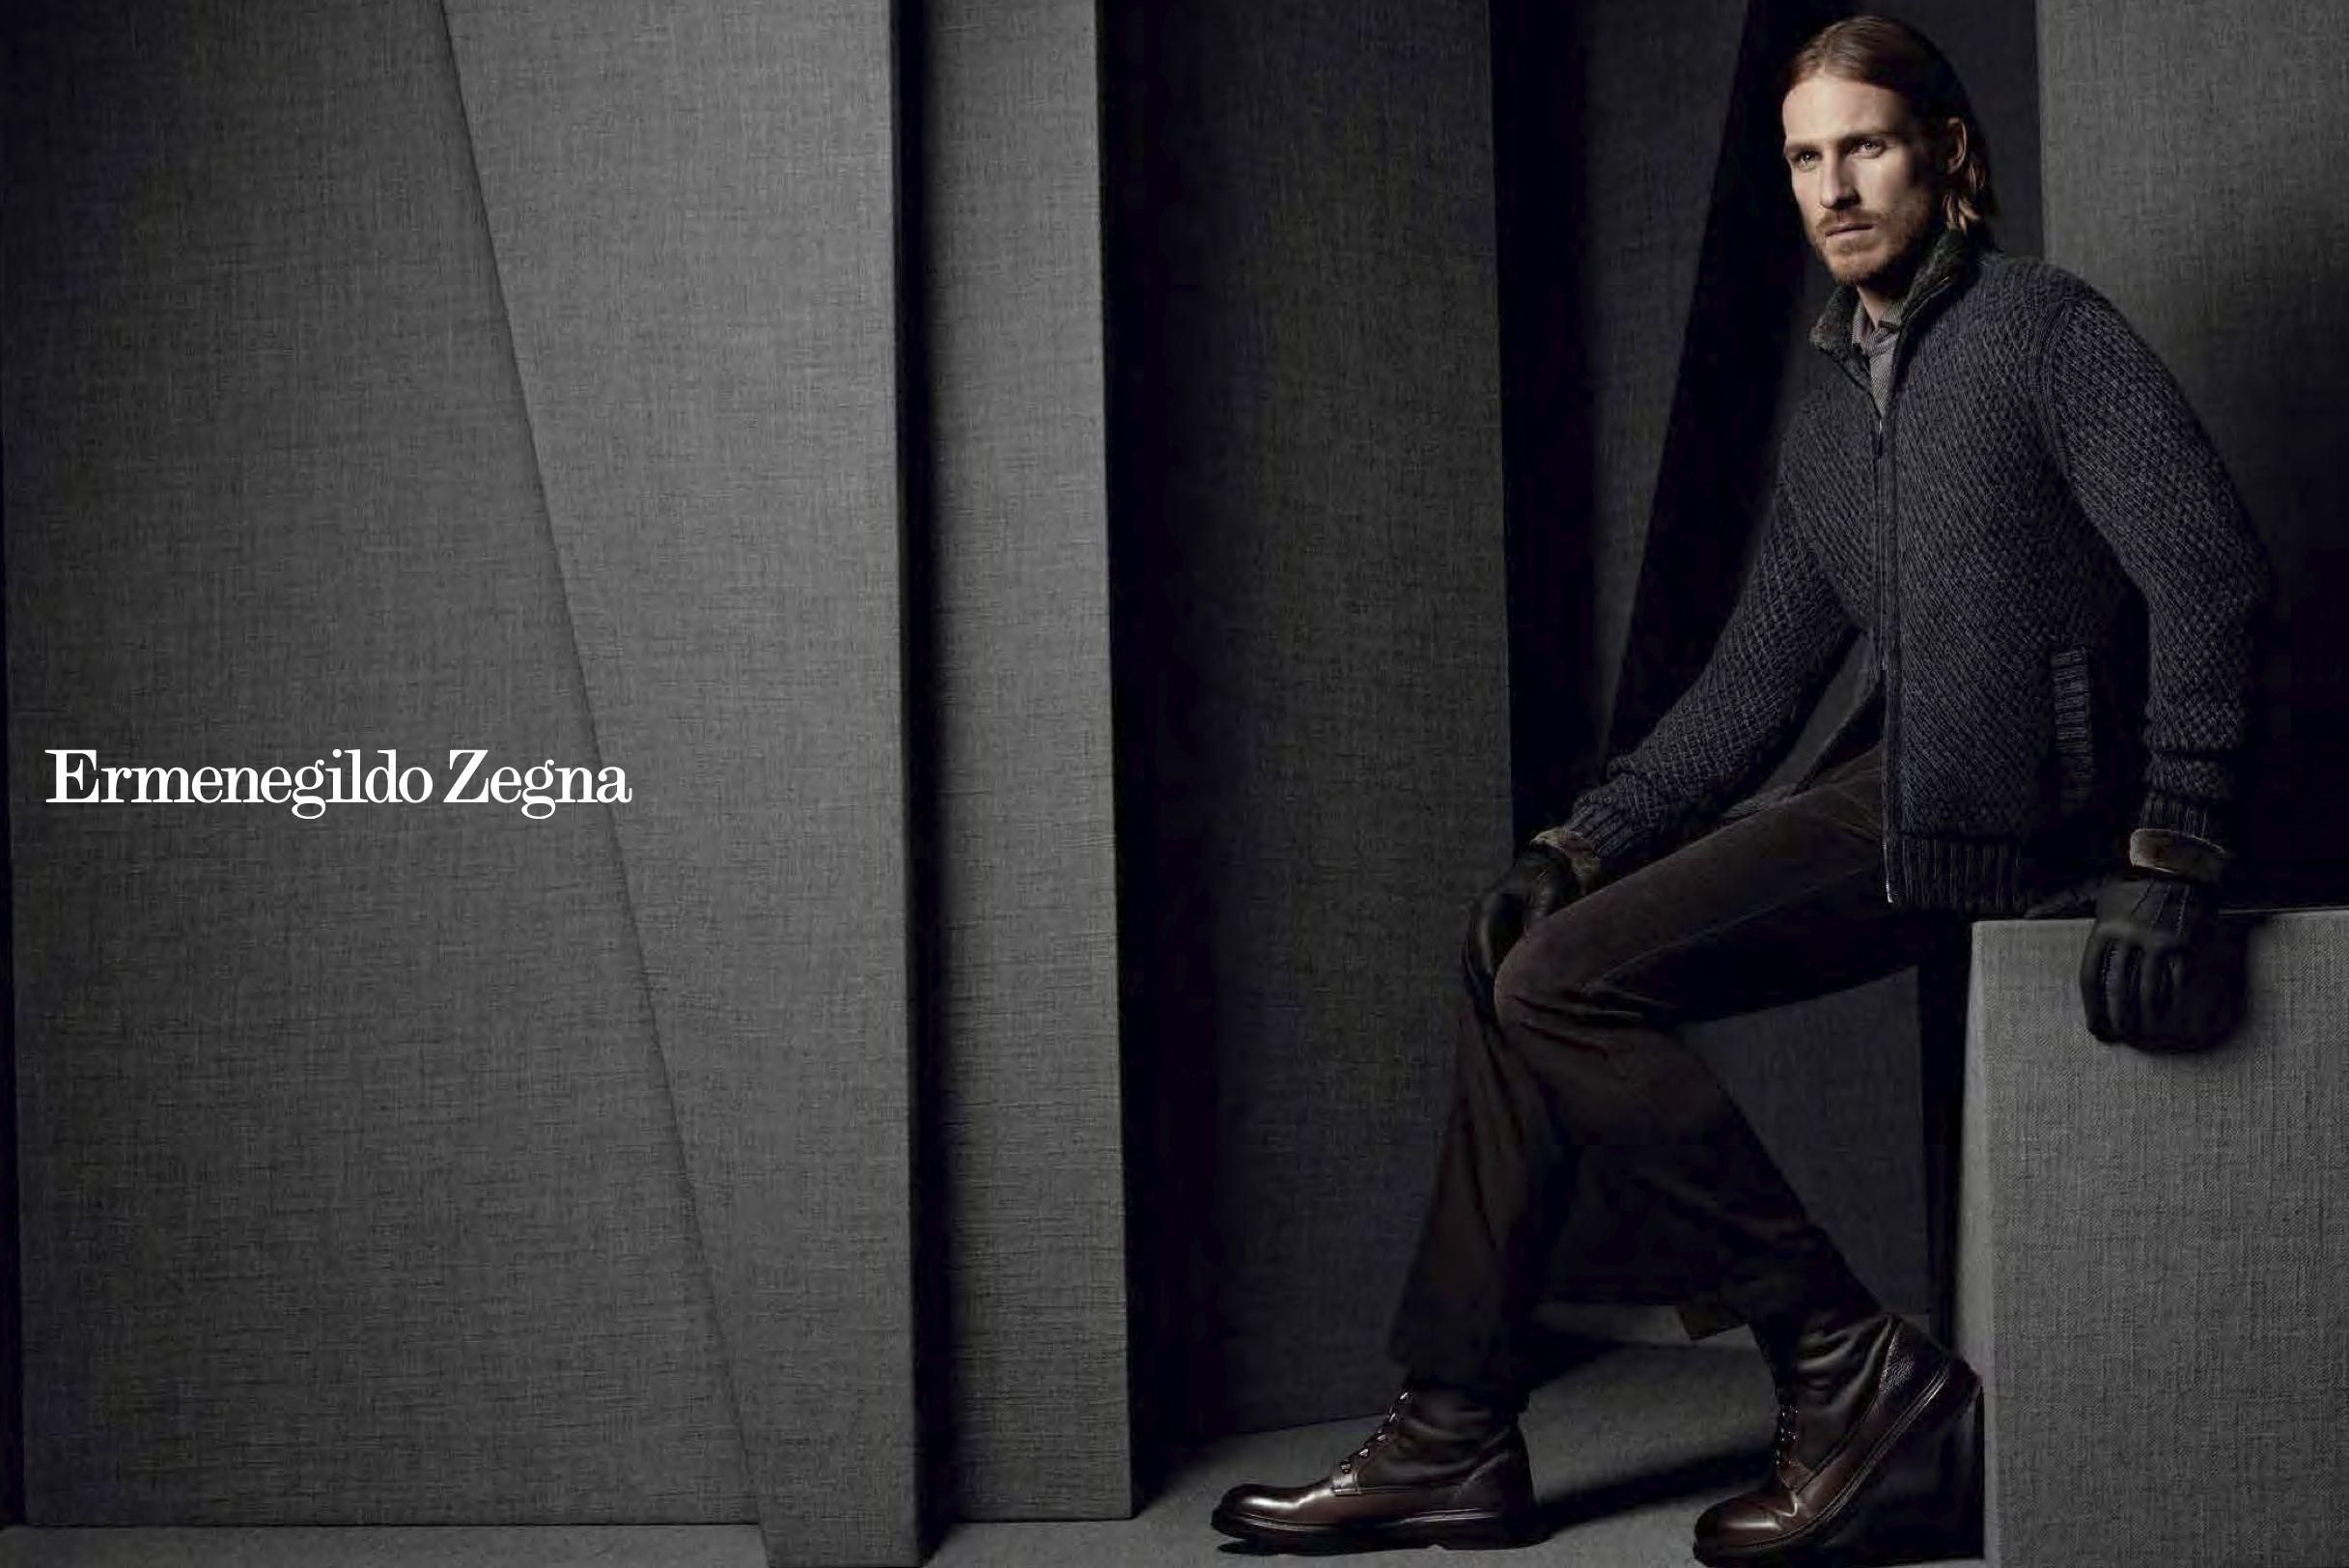 672b3ff142 Ermenegildo Zegna AW13 ad campaign featuring American model Ryan ...